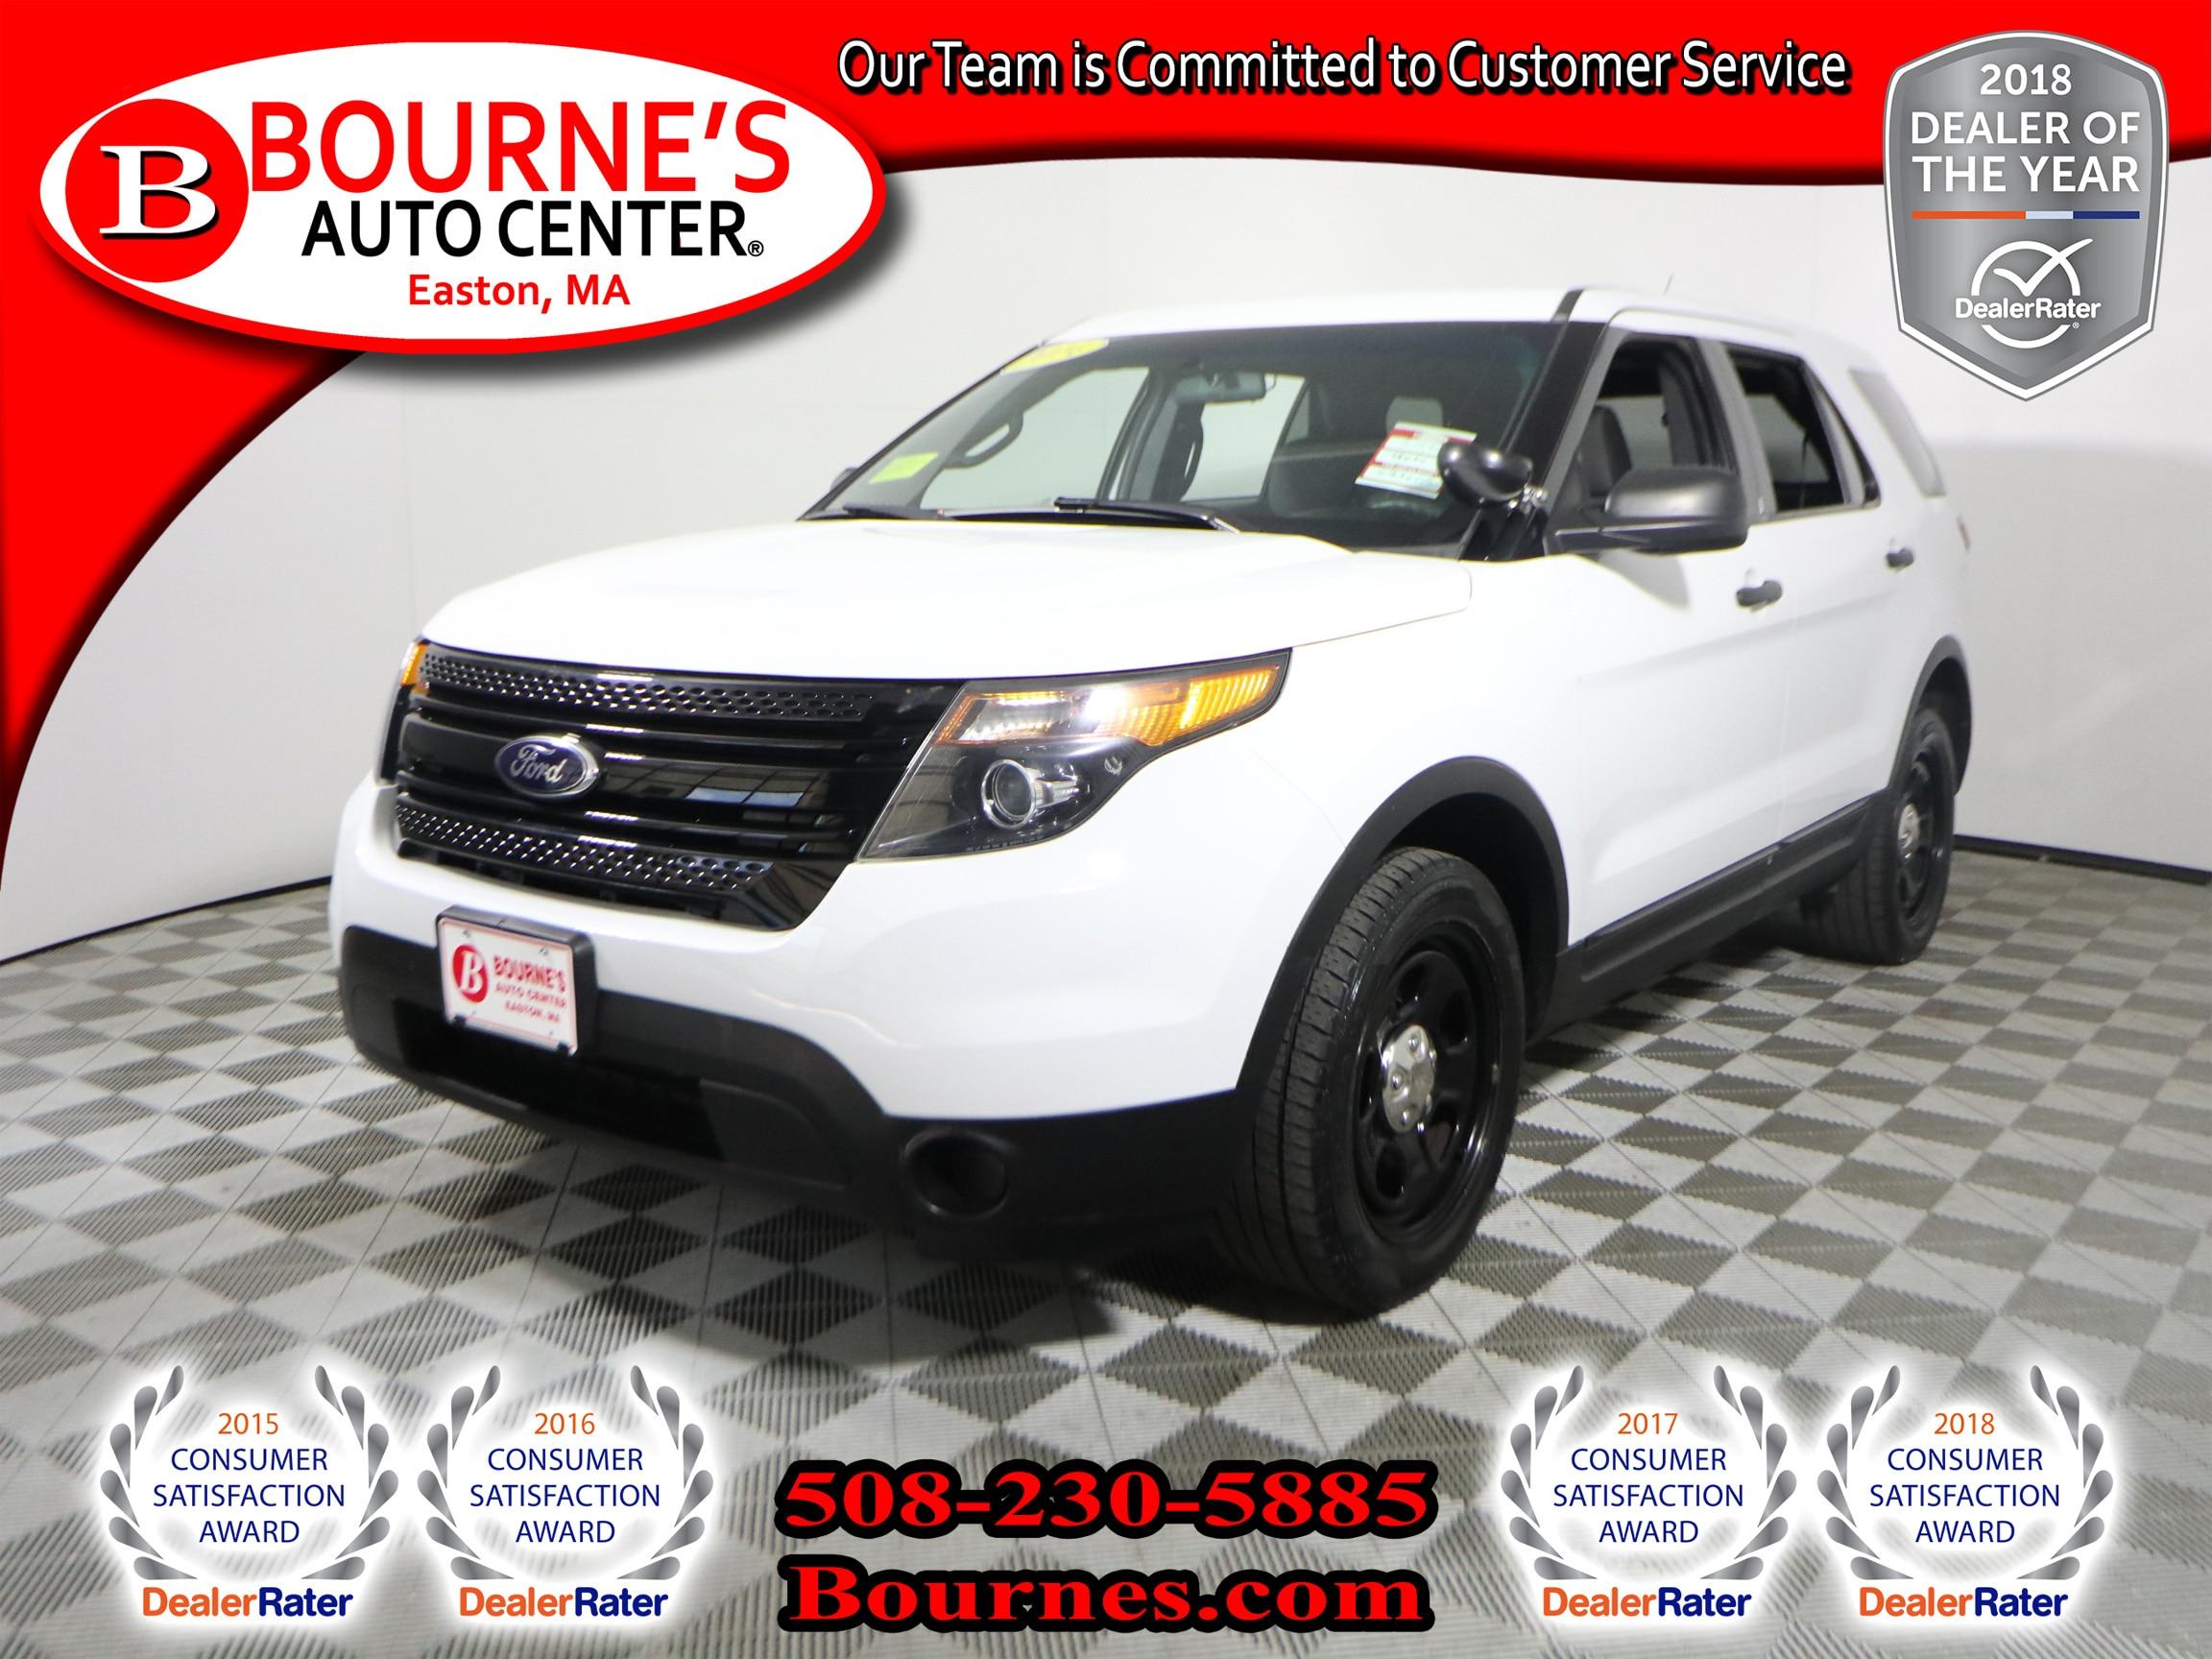 2014 Ford Utility Police Interceptor SUV